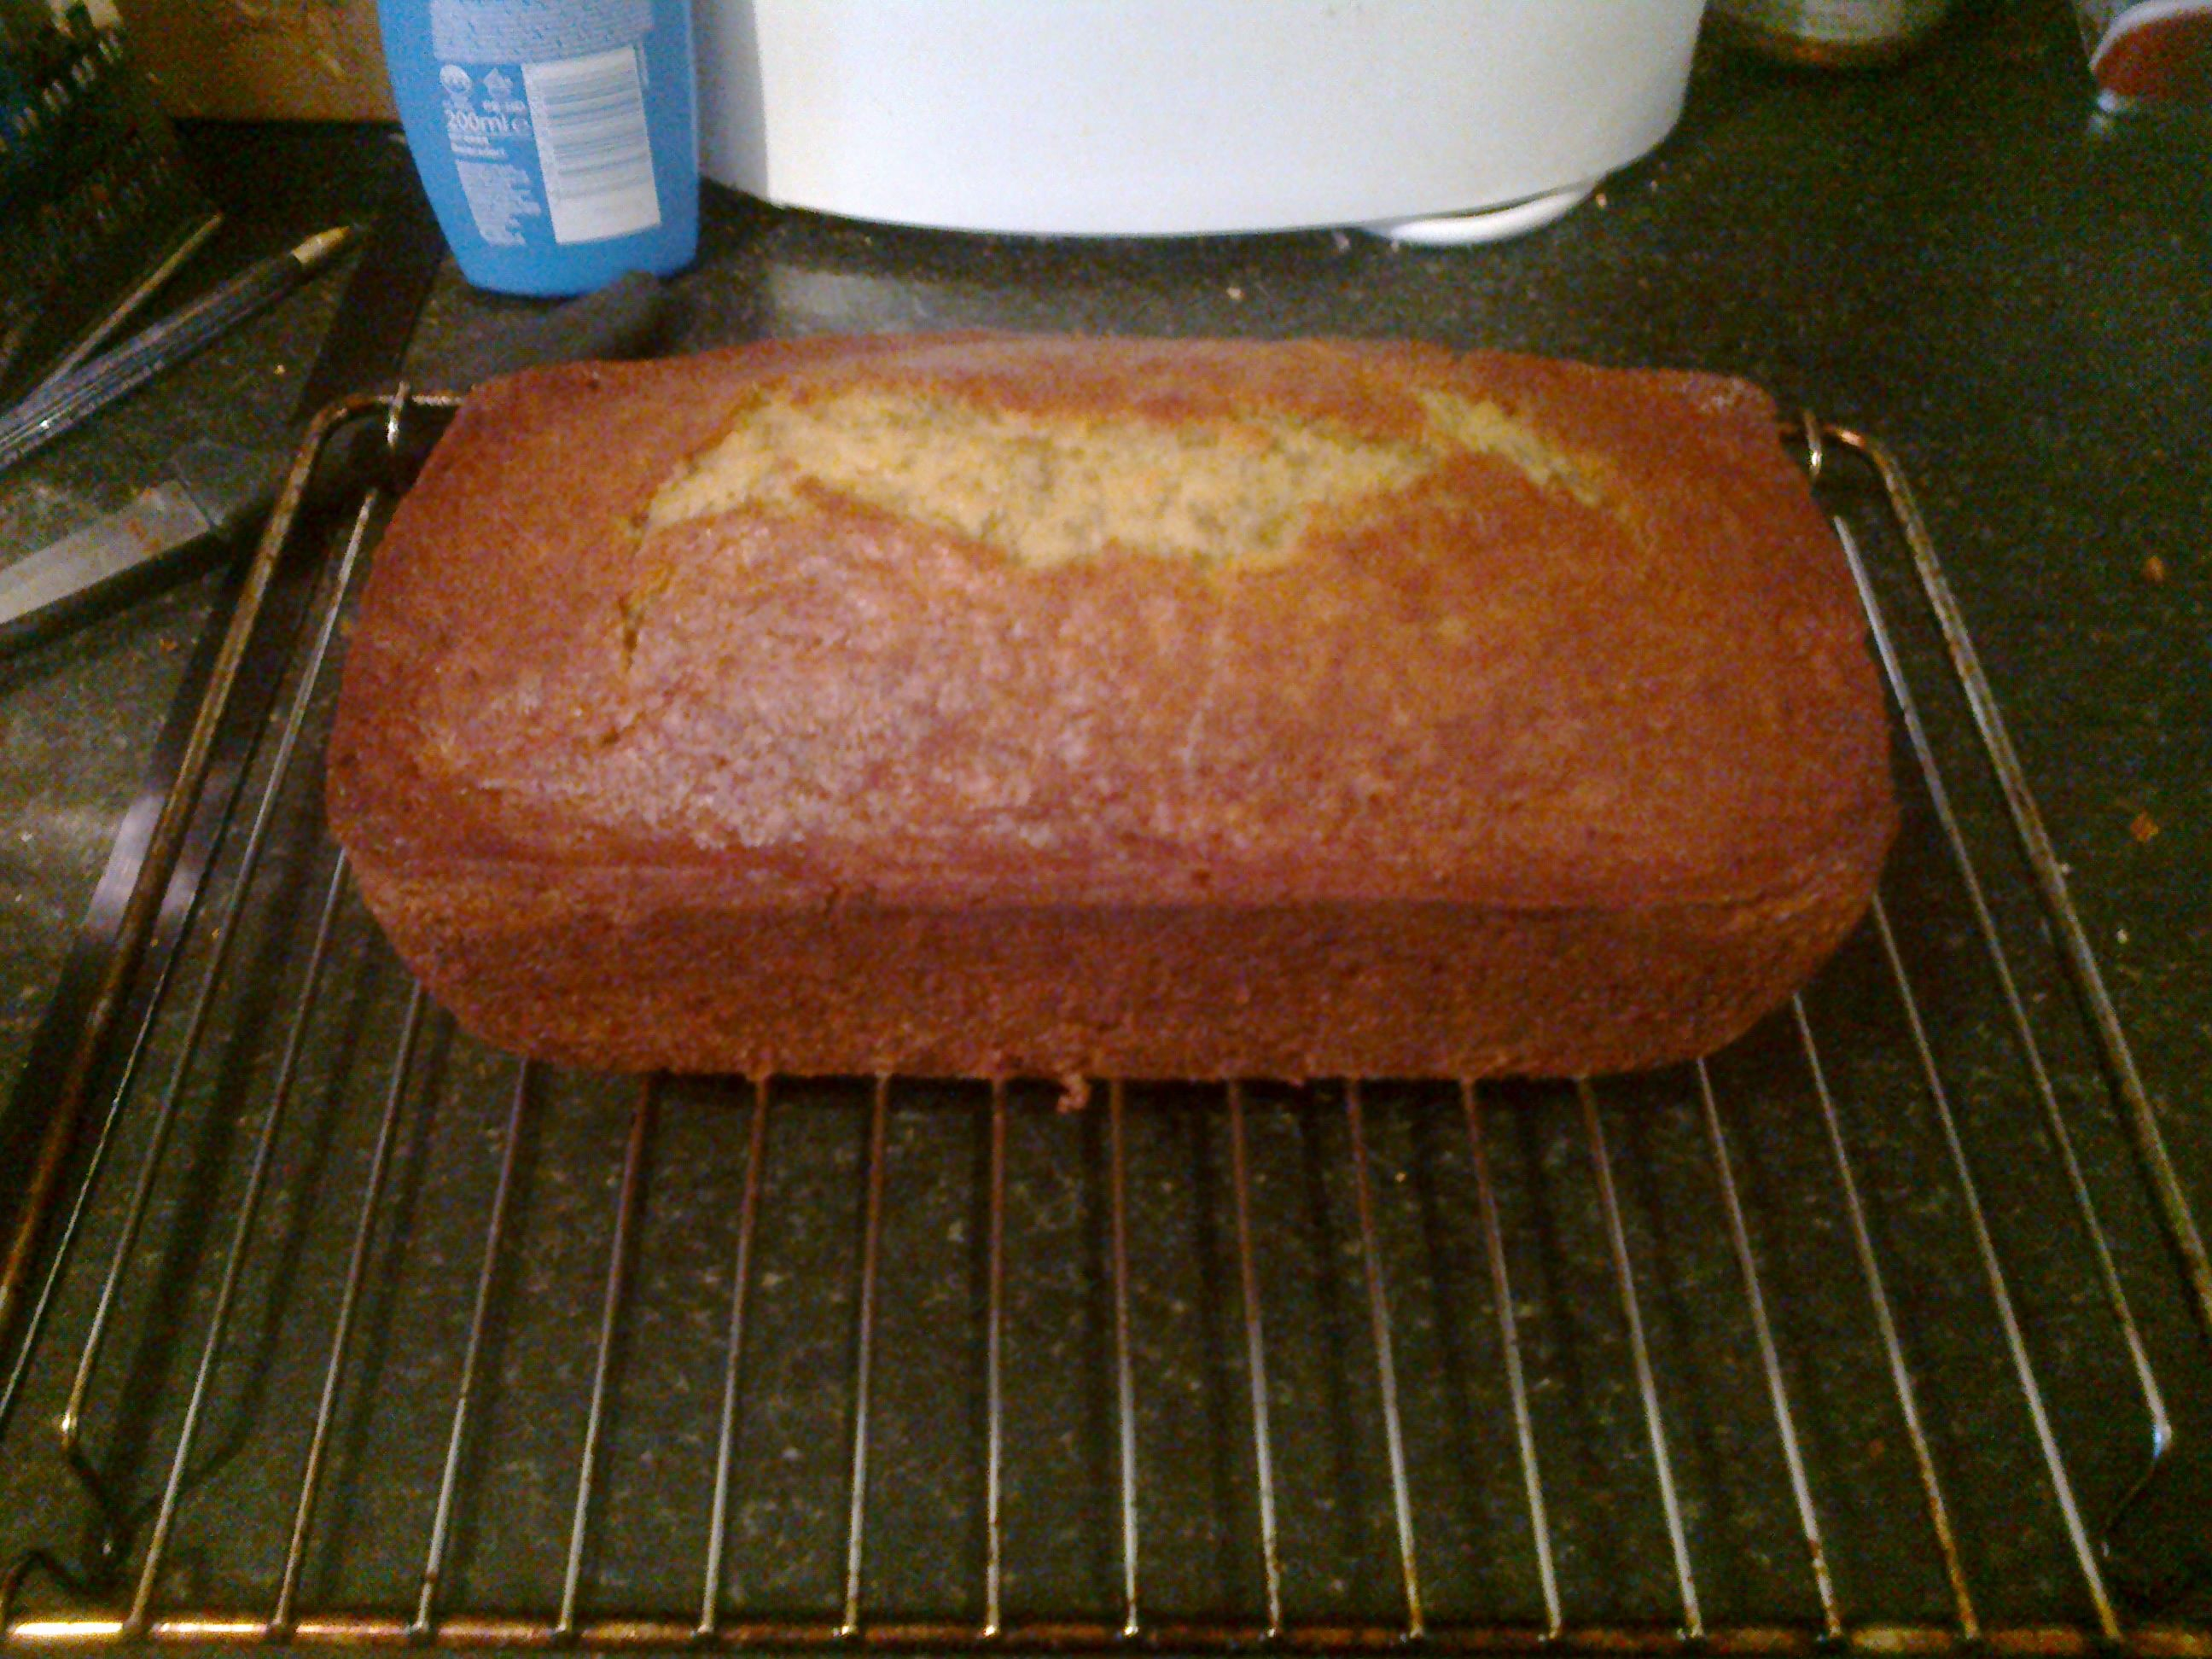 Heeey banana bread httpbbcfoodrecipes heeey banana bread httpbbcfood forumfinder Image collections